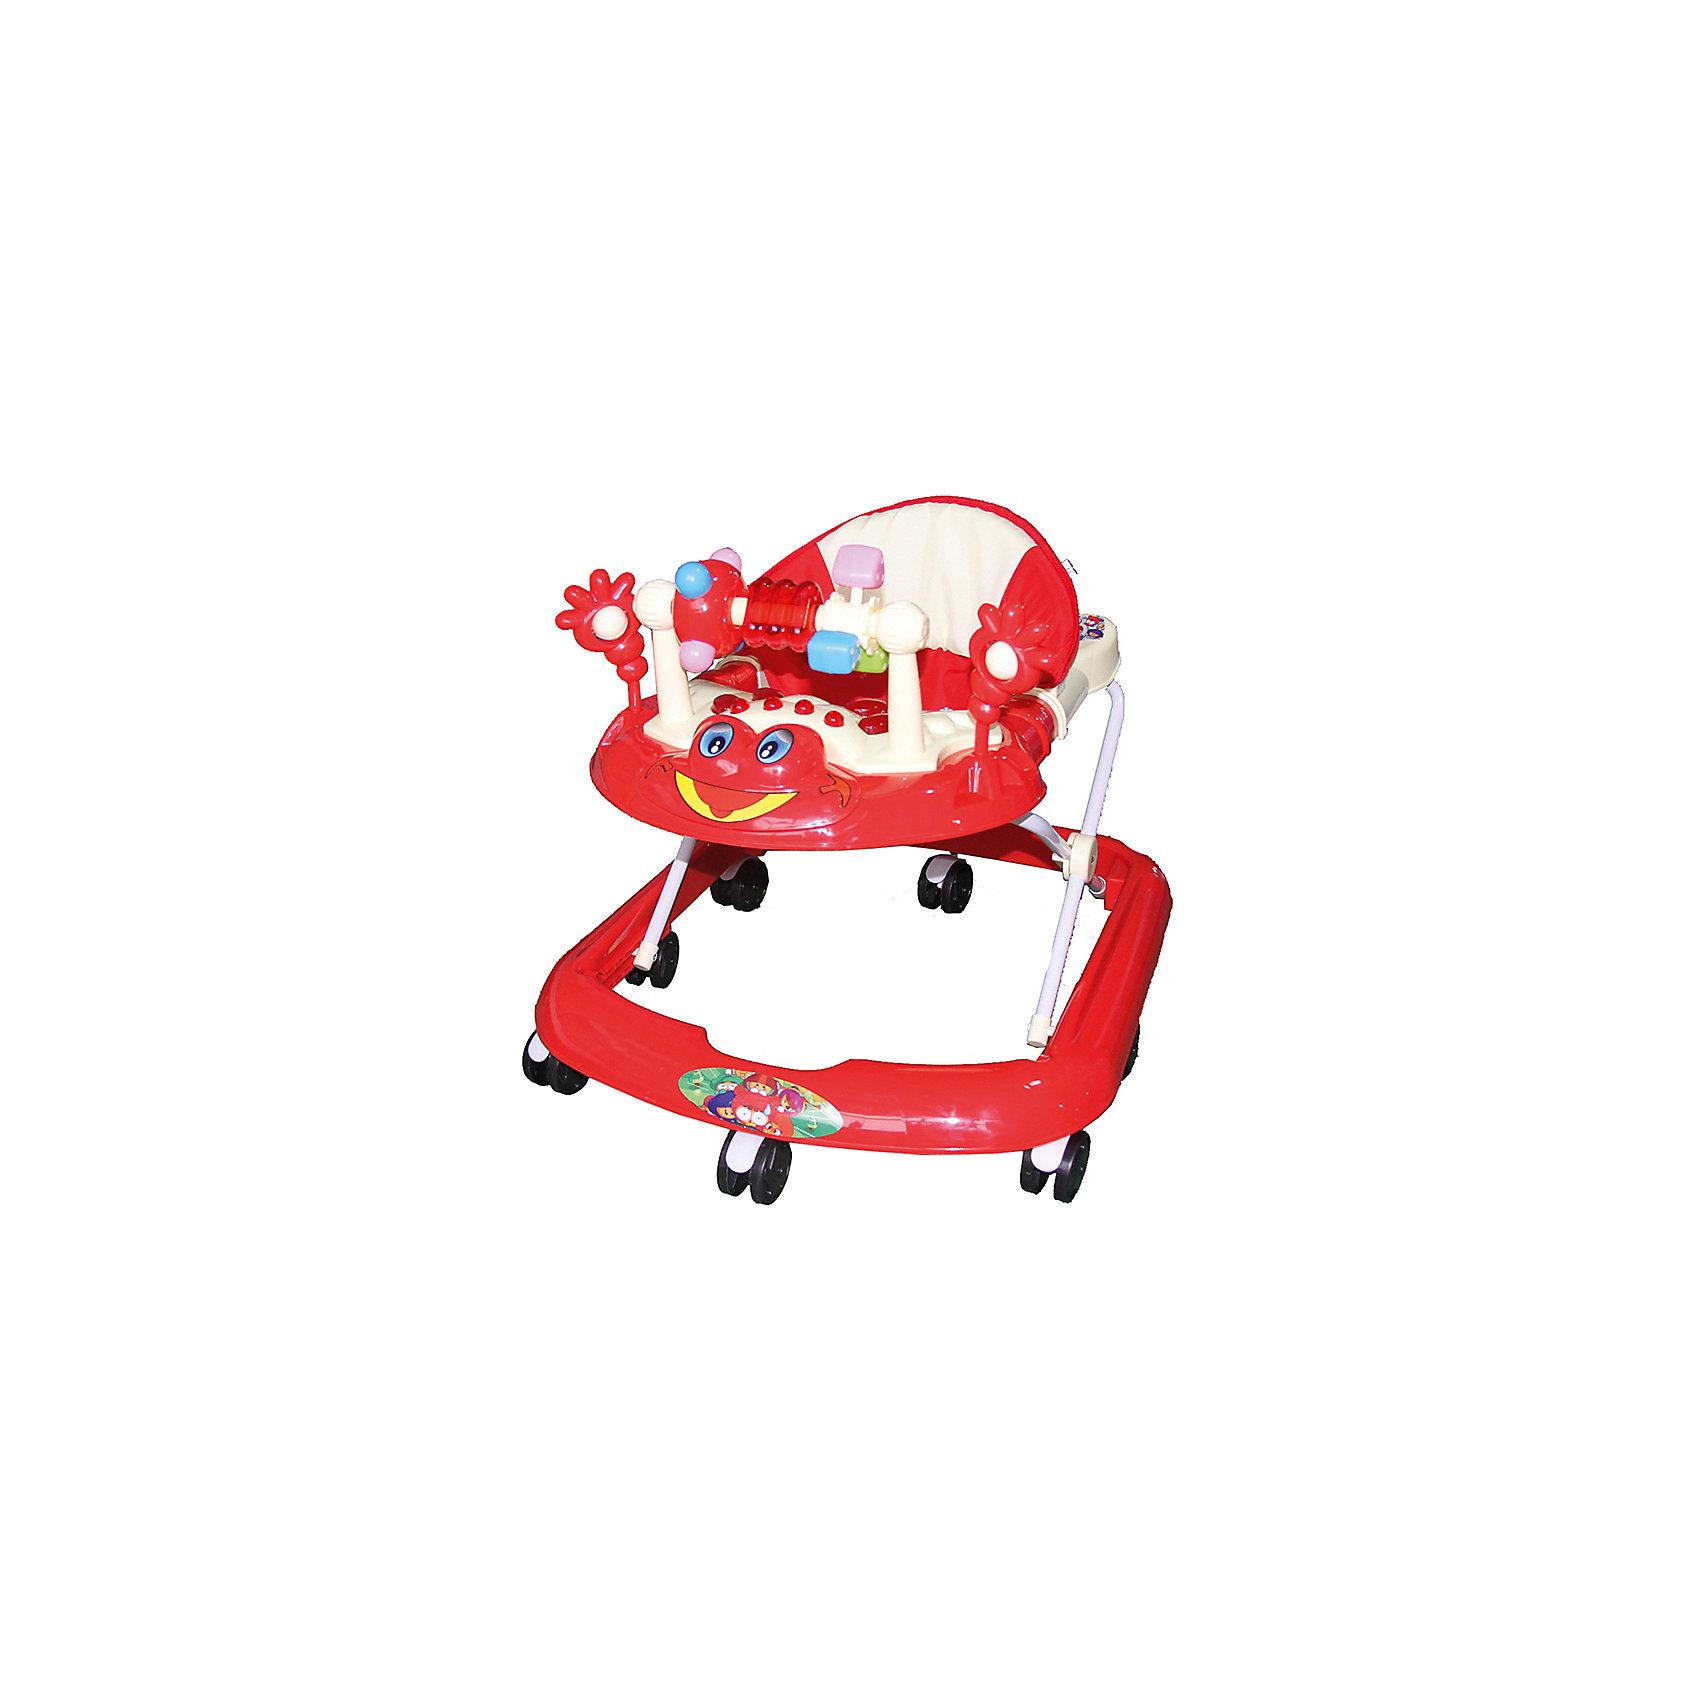 Ходунки Лягушка, Shine Ring, красныйХодунки<br>SHINE RING  Ходунки (8 колес,игрушки,муз) 5 шт в кор.(67*60*51), RED/ Красный<br><br>Ширина мм: 670<br>Глубина мм: 600<br>Высота мм: 520<br>Вес г: 2800<br>Возраст от месяцев: 6<br>Возраст до месяцев: 12<br>Пол: Унисекс<br>Возраст: Детский<br>SKU: 5559215